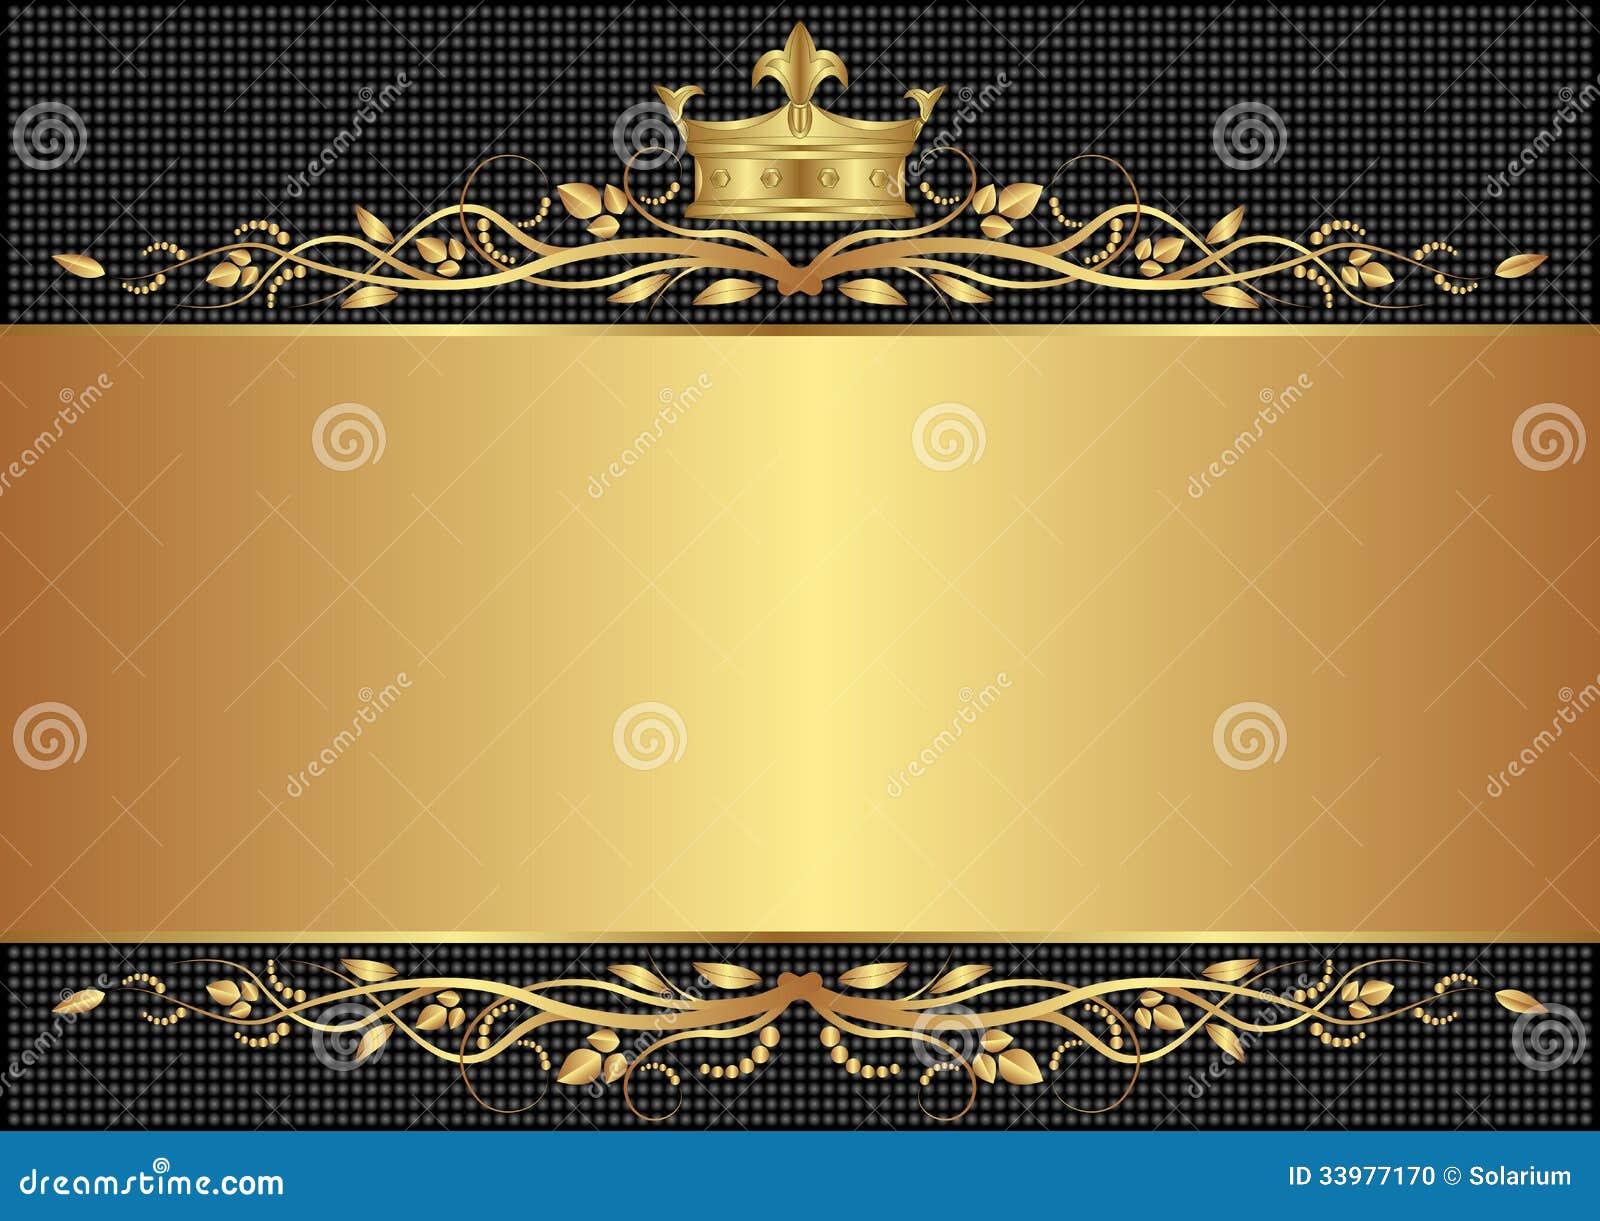 Maroon Wedding Invitations 009 - Maroon Wedding Invitations